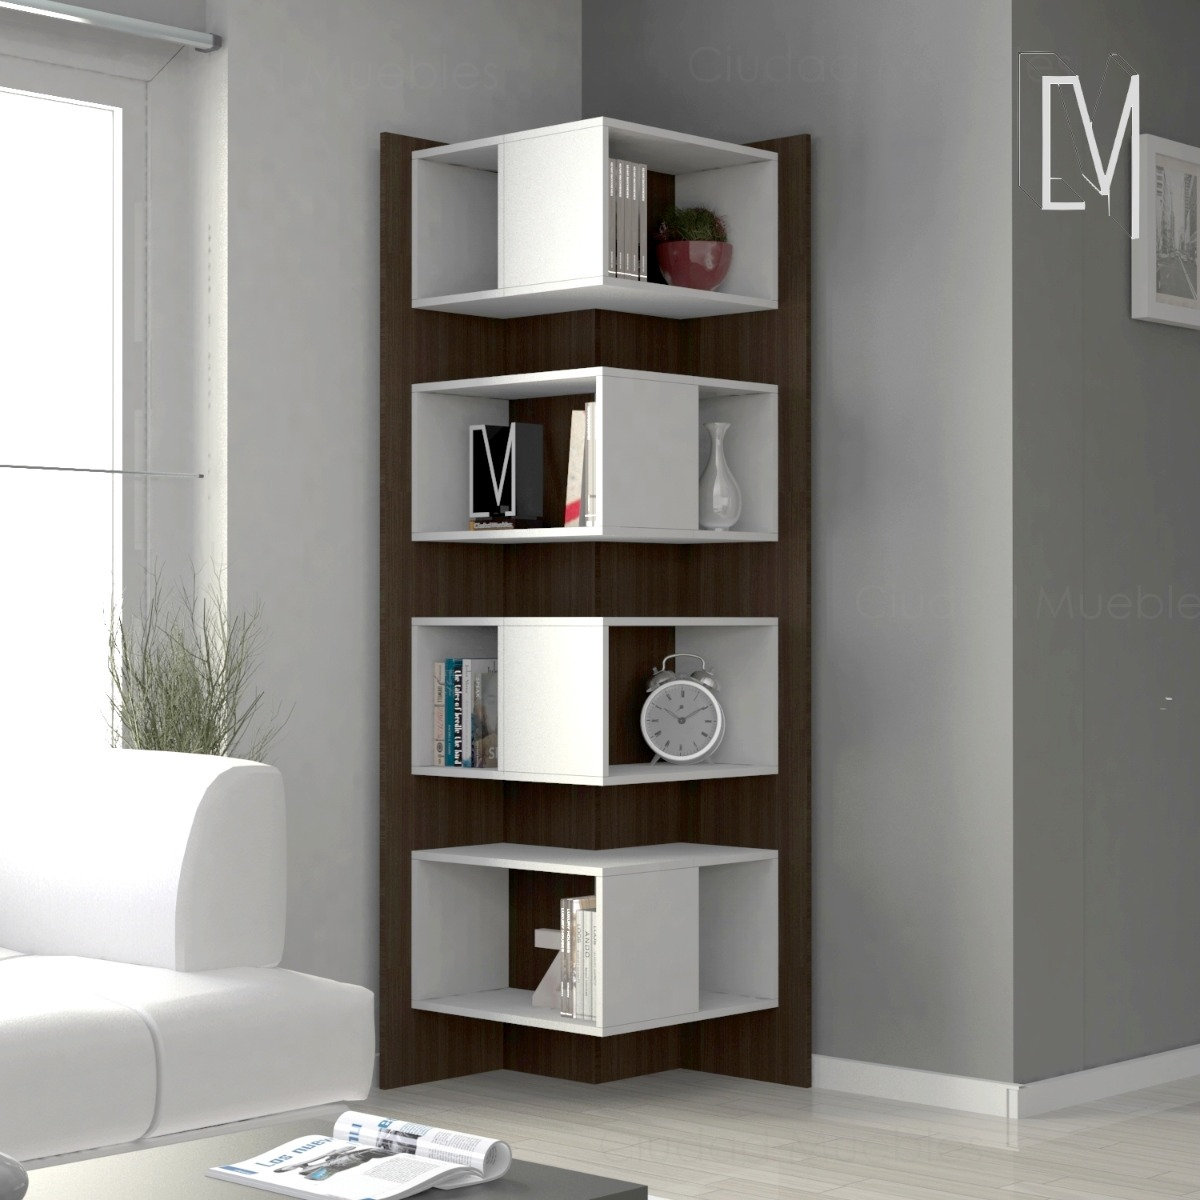 Modular Esquinero Biblioteca Estanteria Ciudad Muebles